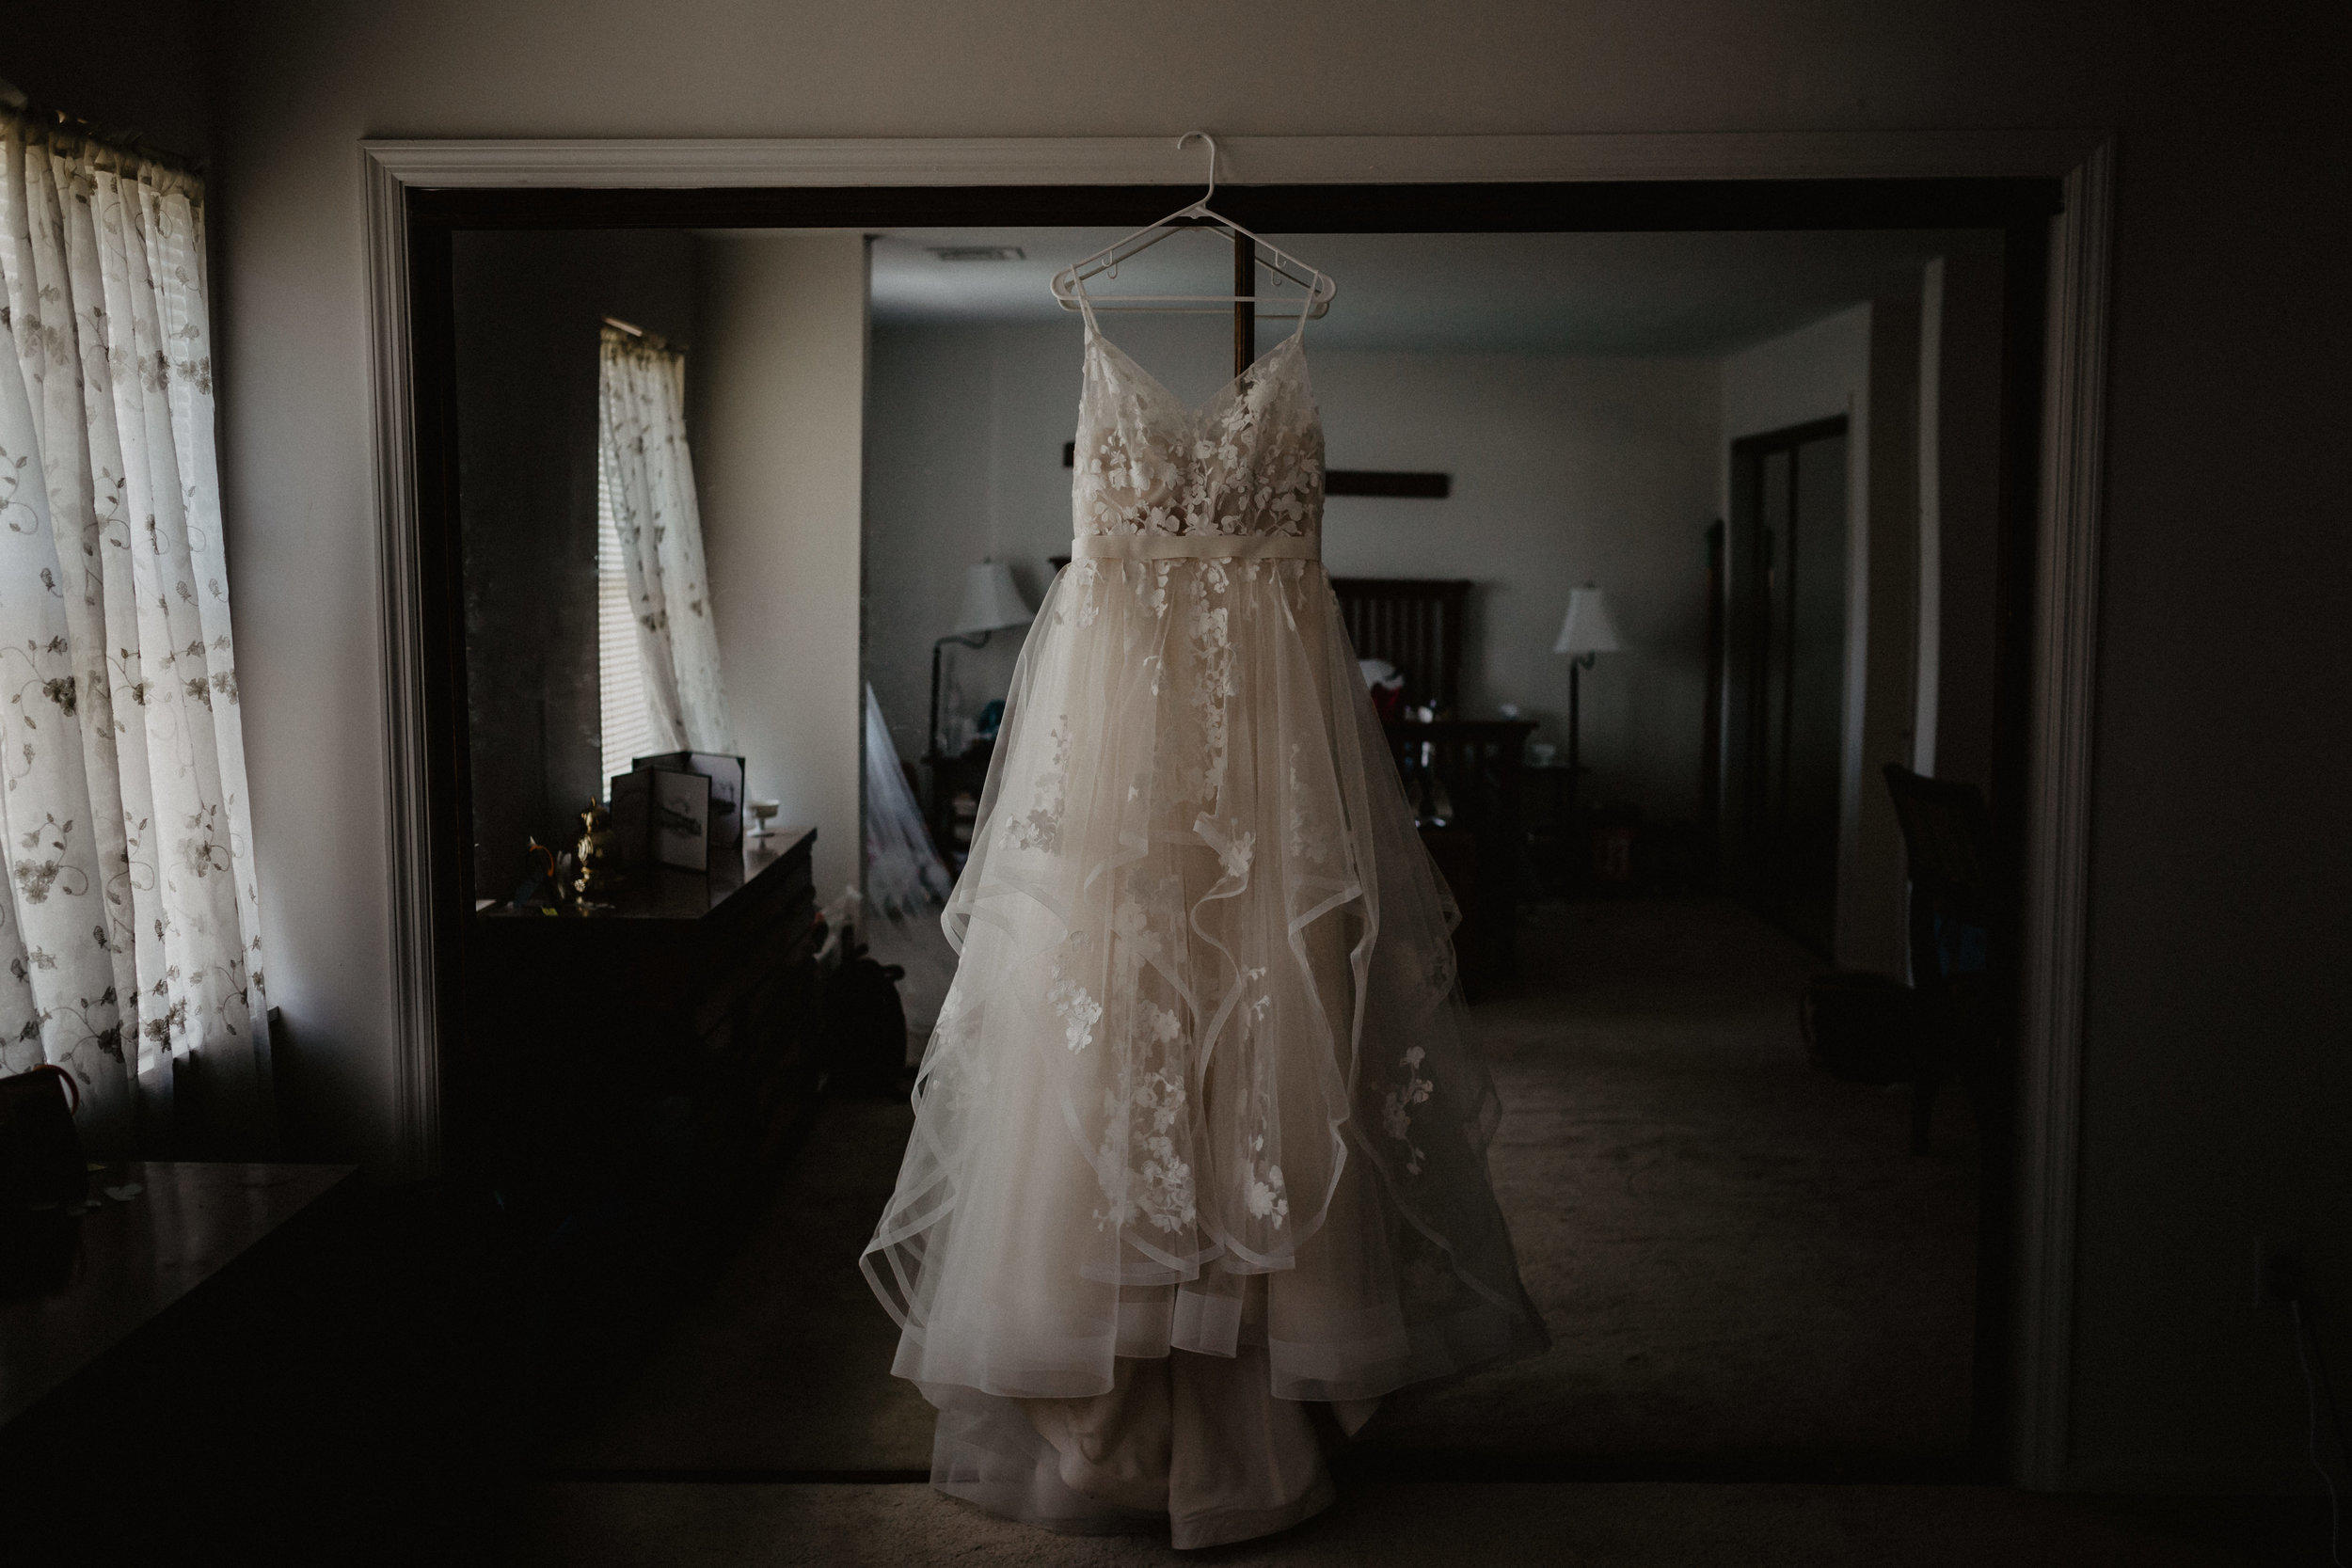 upstate_ny_wedding-11.jpg